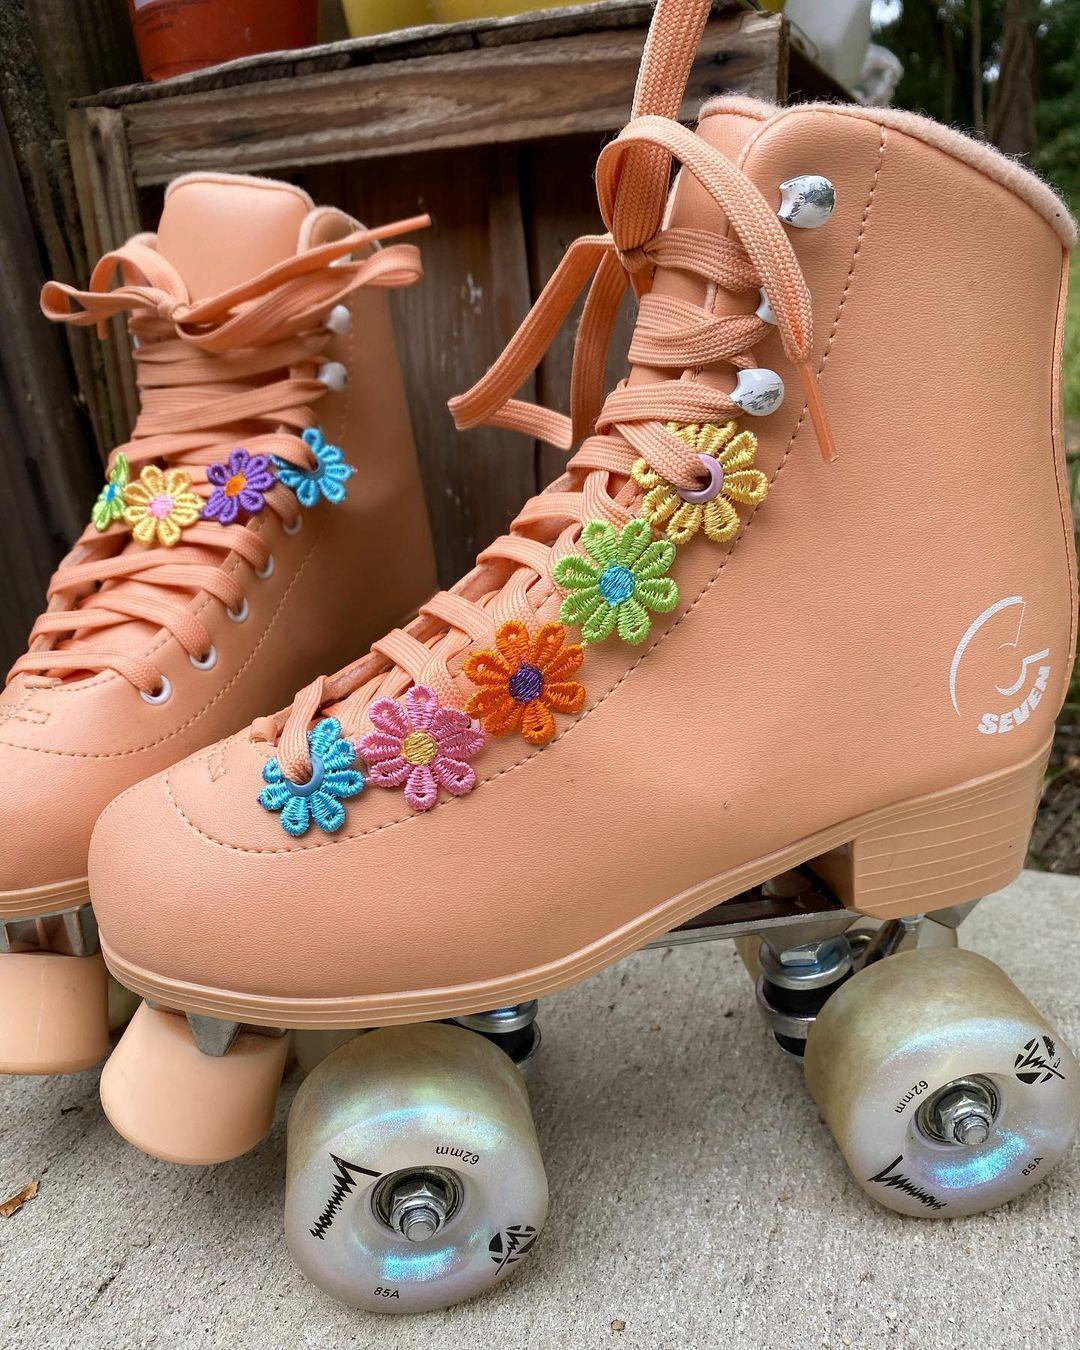 Escapingtheordinary On Instagram Rainbow Daisy Chains White Daisy Chains In 2021 Quad Roller Skates Roller Skating Roller Skates